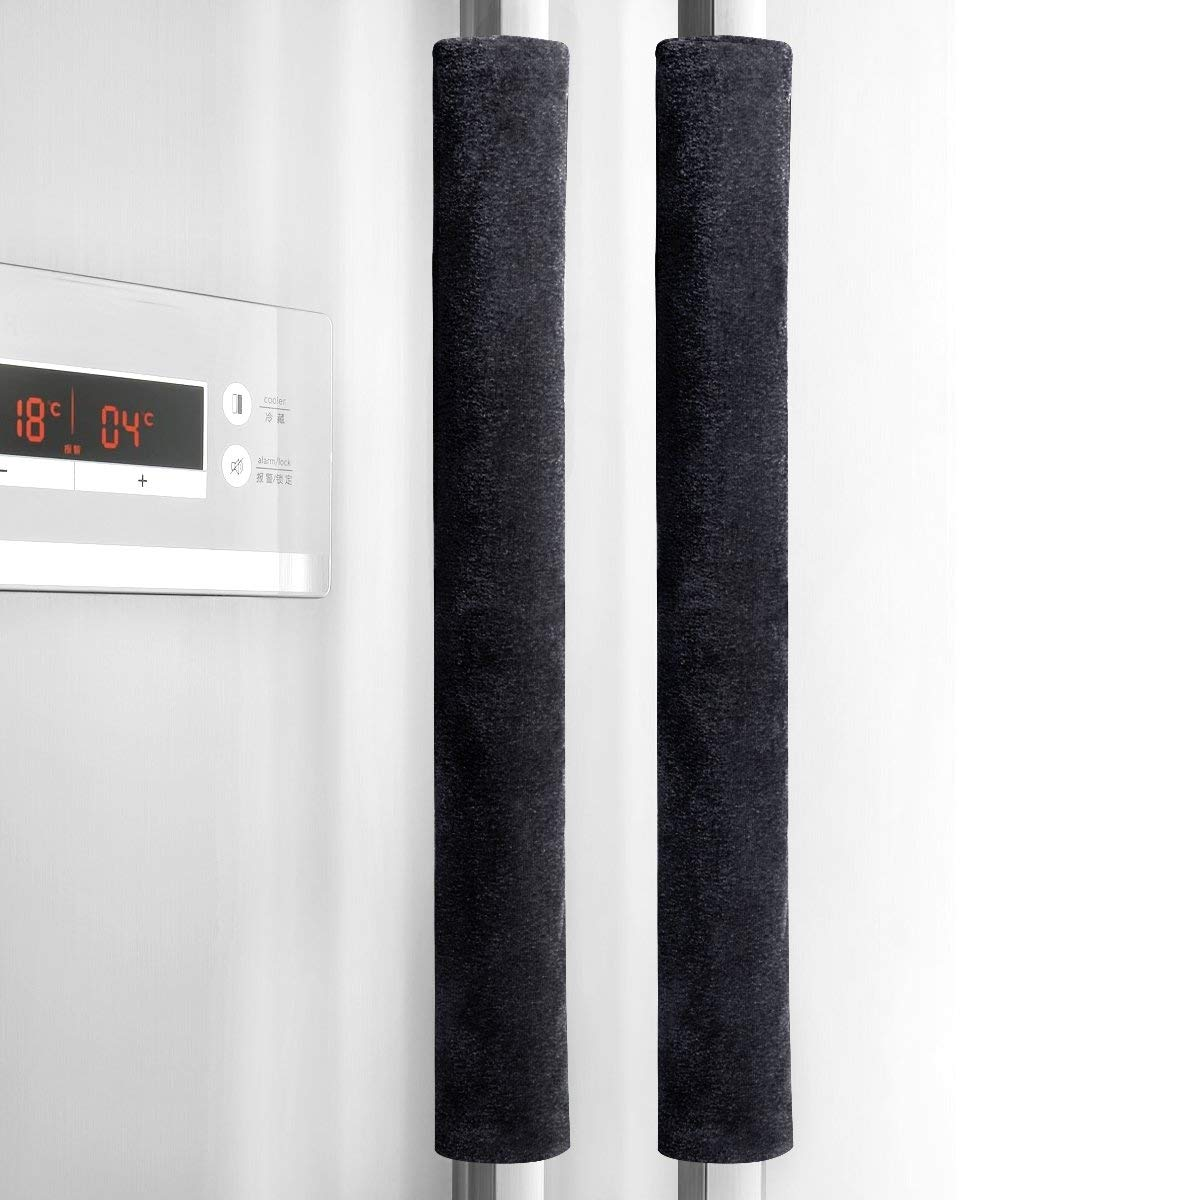 Refrigerator Door Handle Cover Kitchen Appliance Decor Handles Antiskid Protector Gloves for Fridge Oven Keep off Fingerp